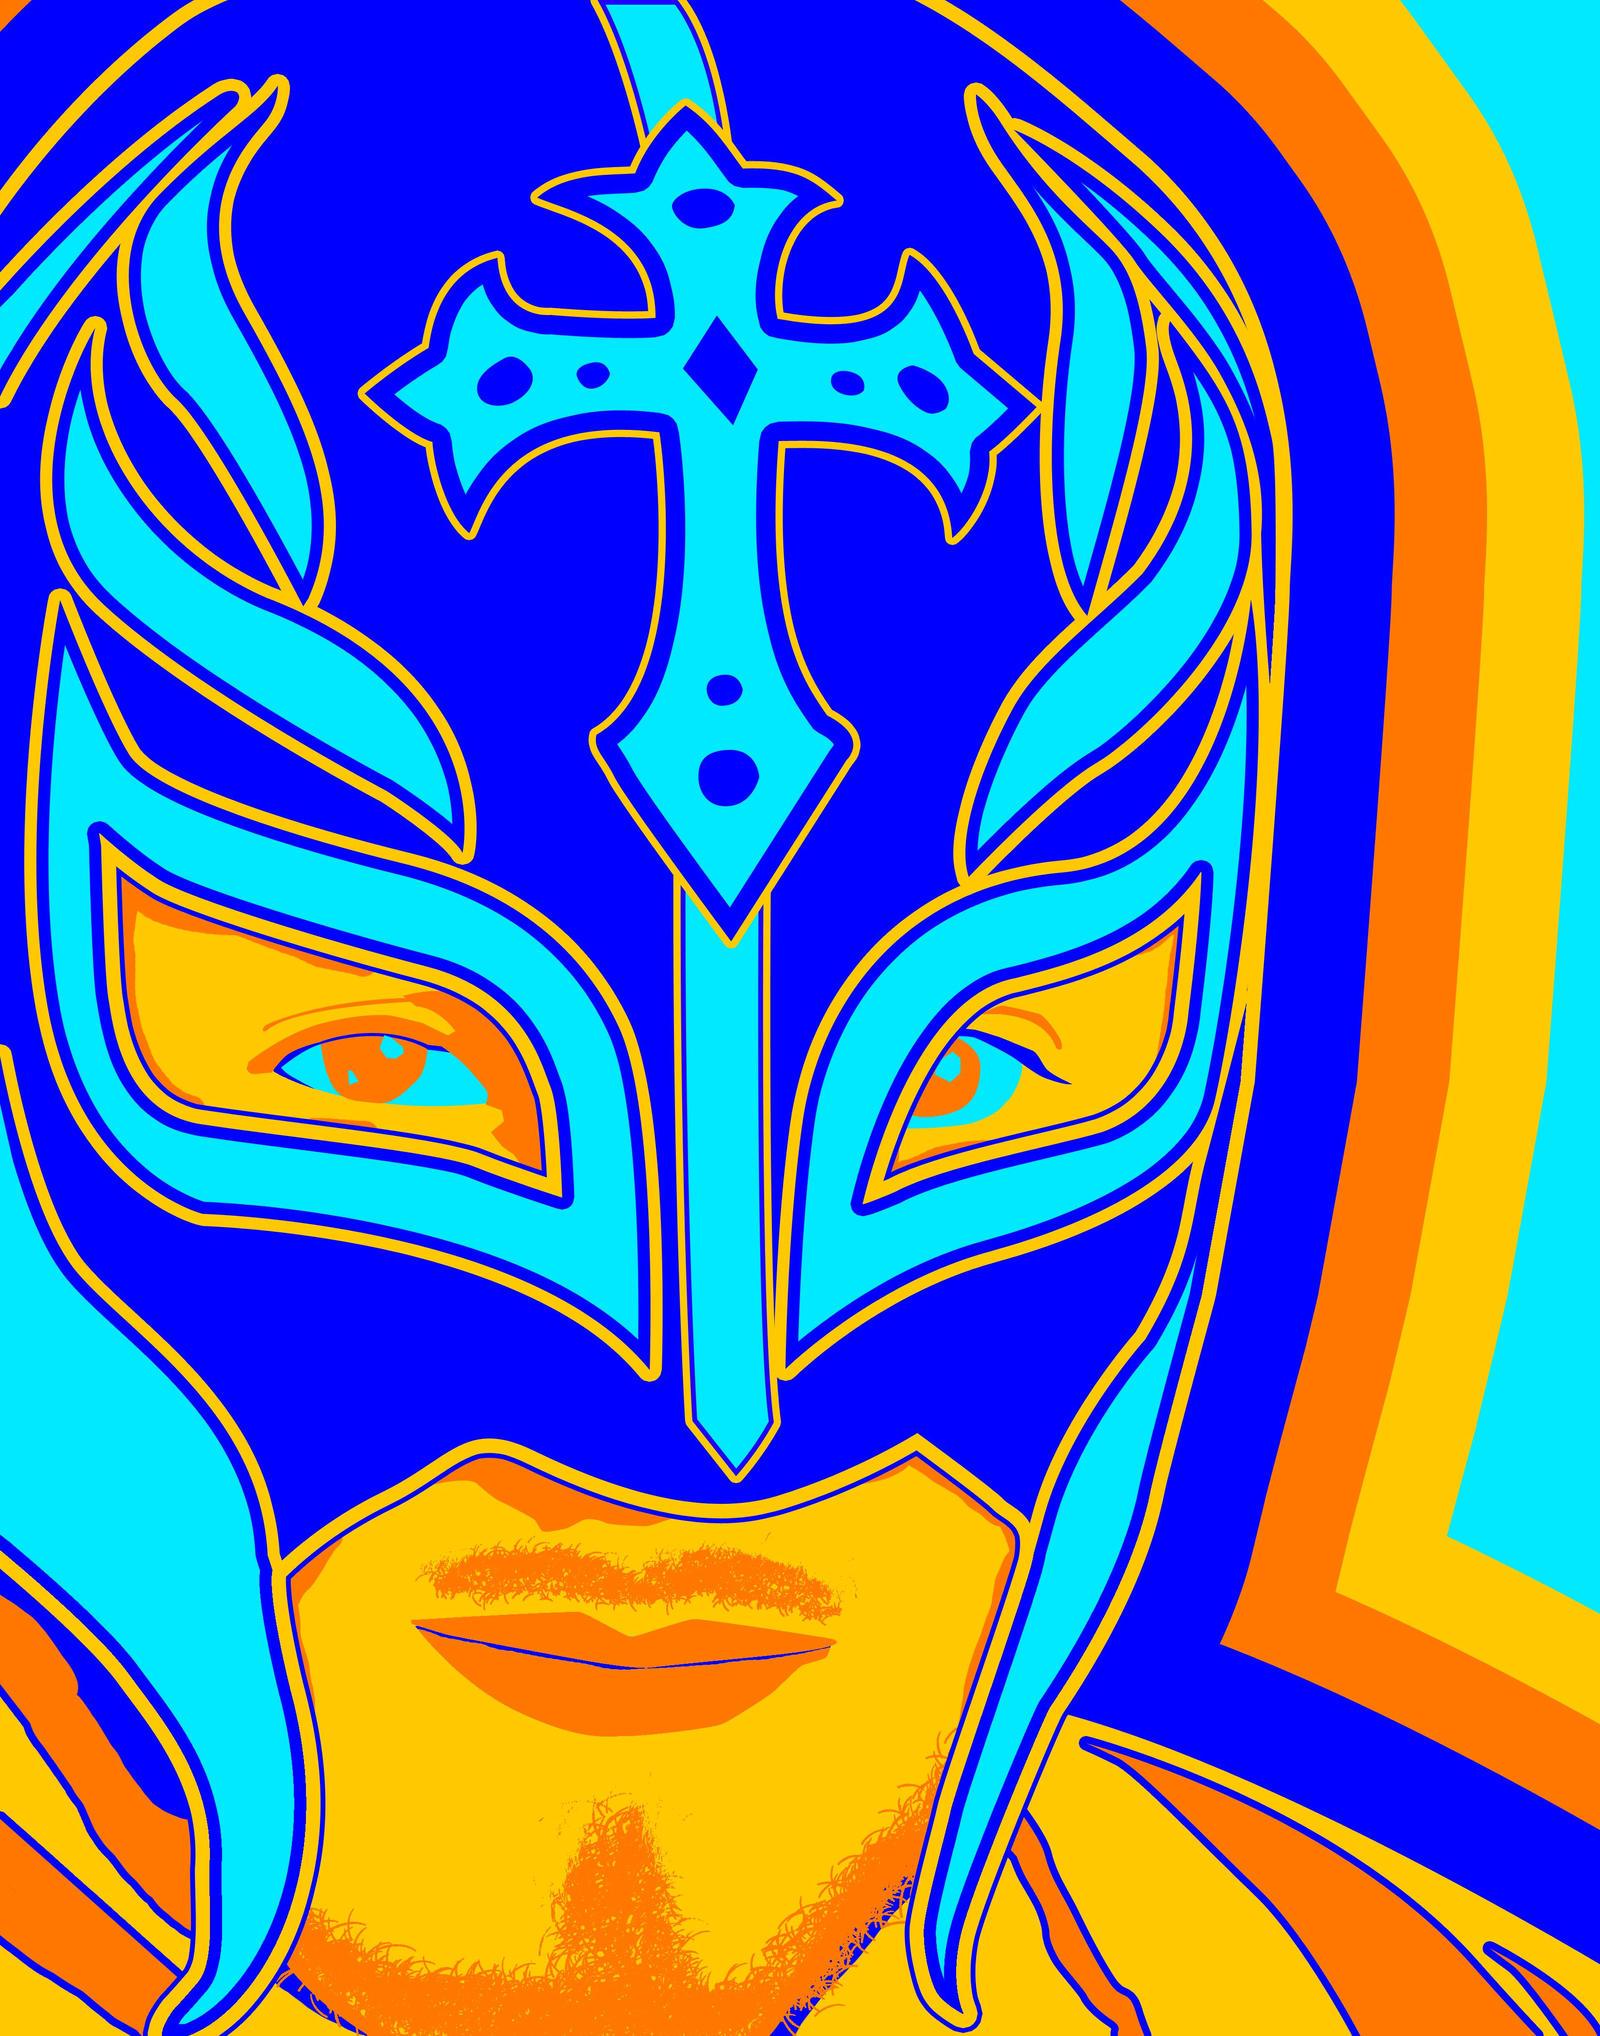 KayFriday 0 WWE Rey Mysterio